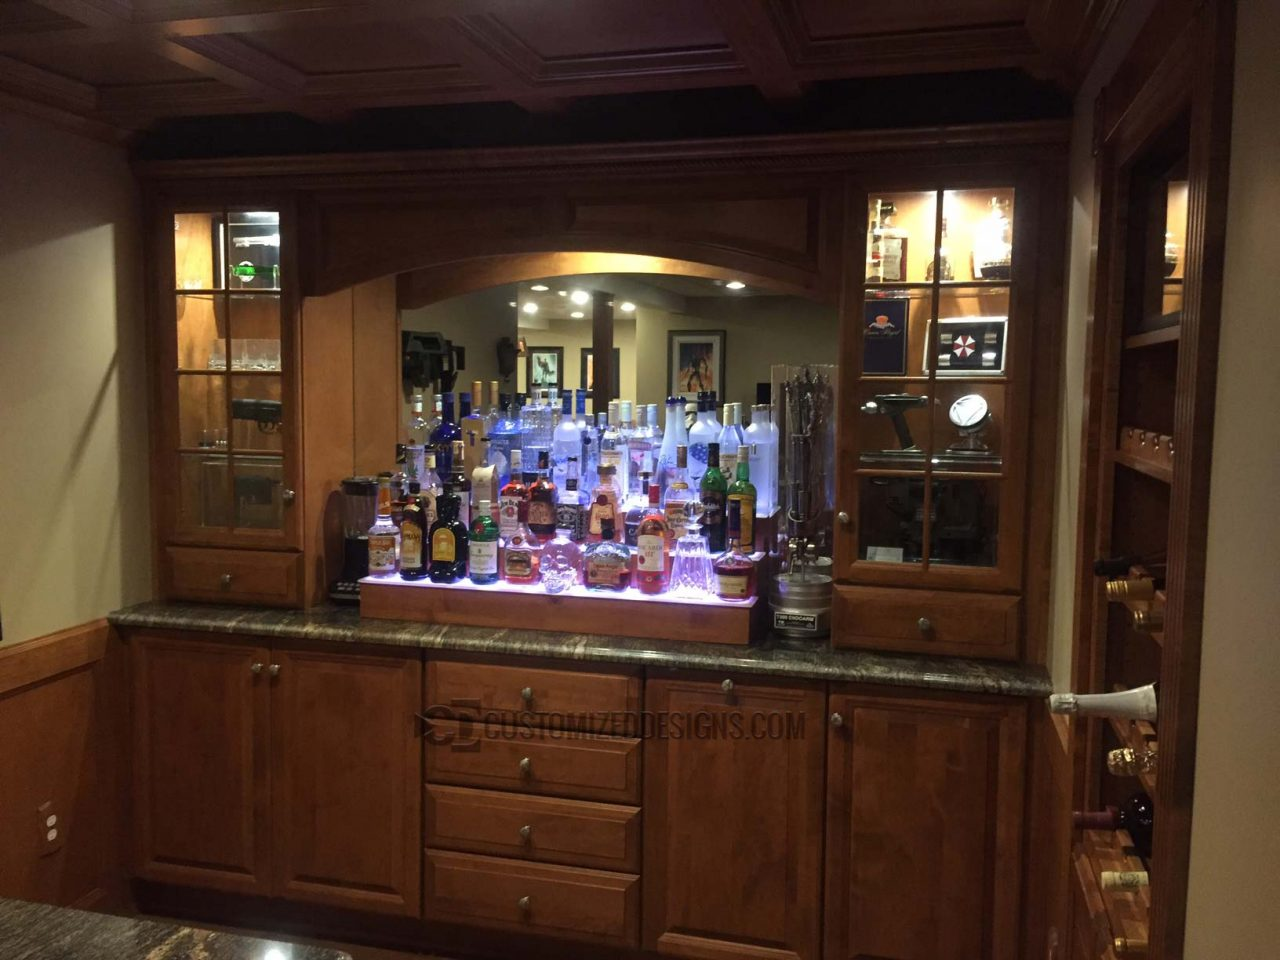 Cool Sci-Fi Themed Home Bar w/ Cherry Wood Shelves